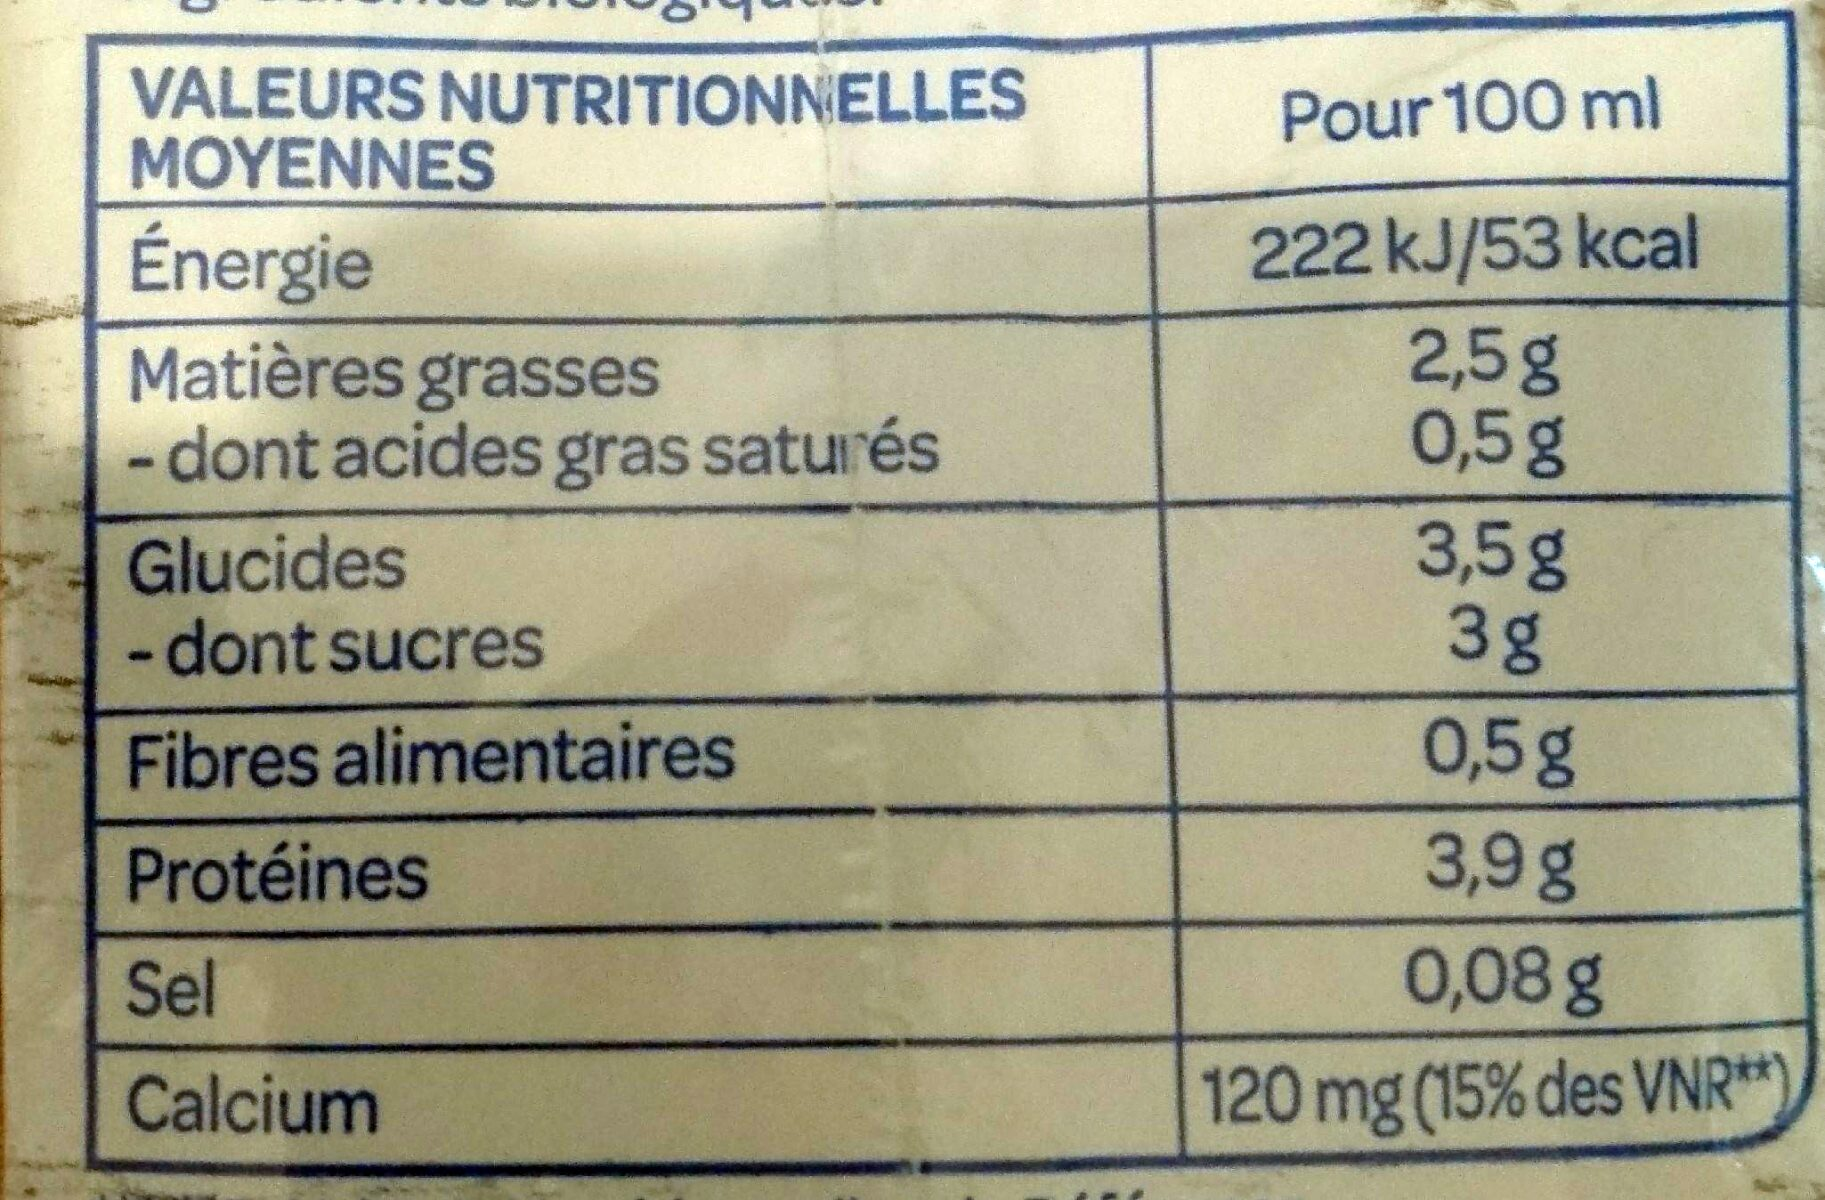 Soja calcium - Nutrition facts - fr